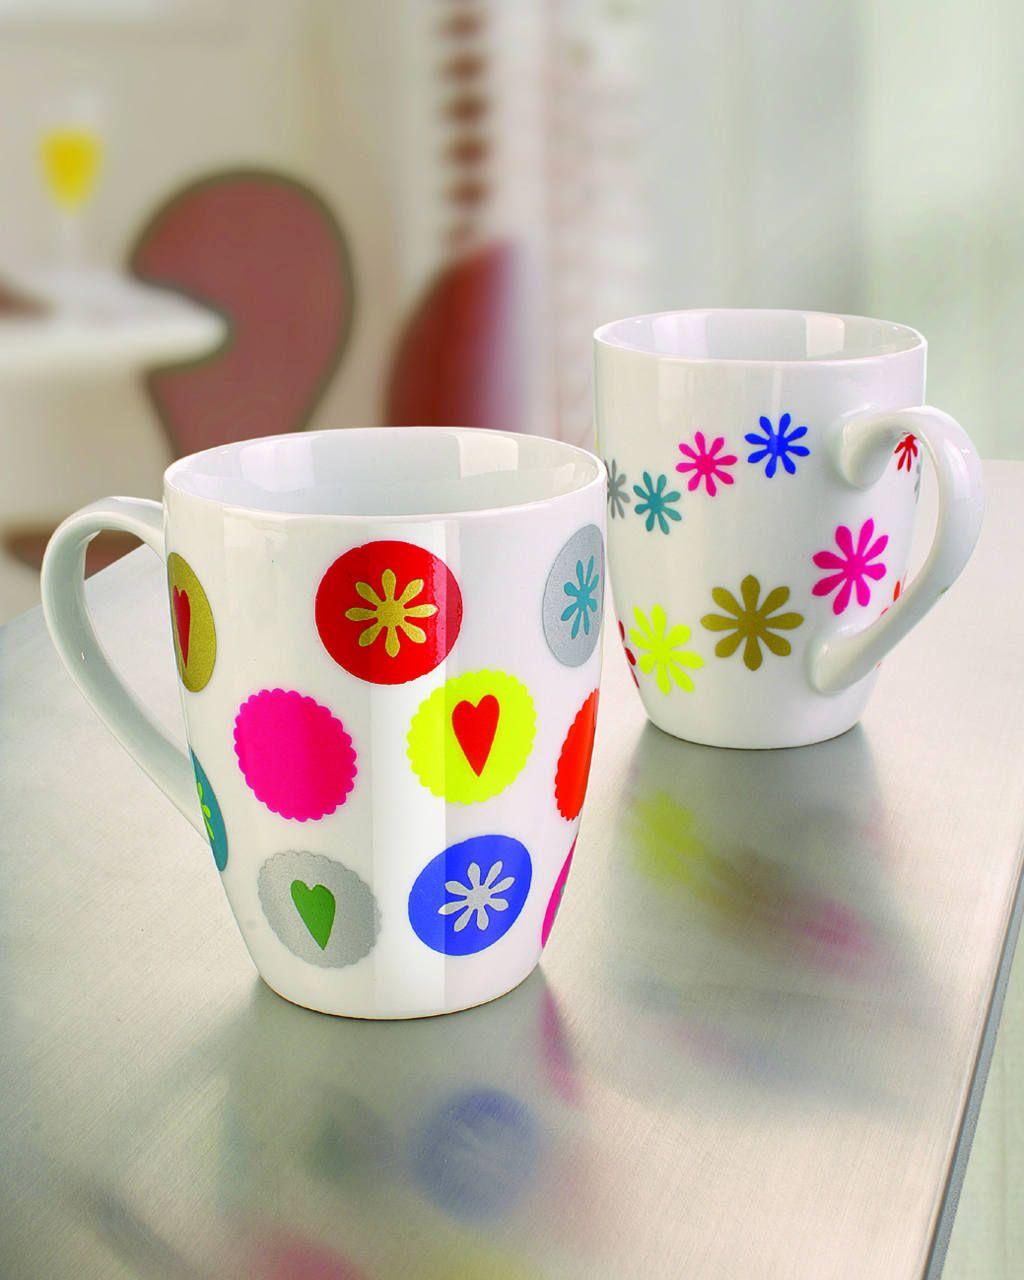 Tasse/Color-Dekor mit Motivlochern - creadoo.com